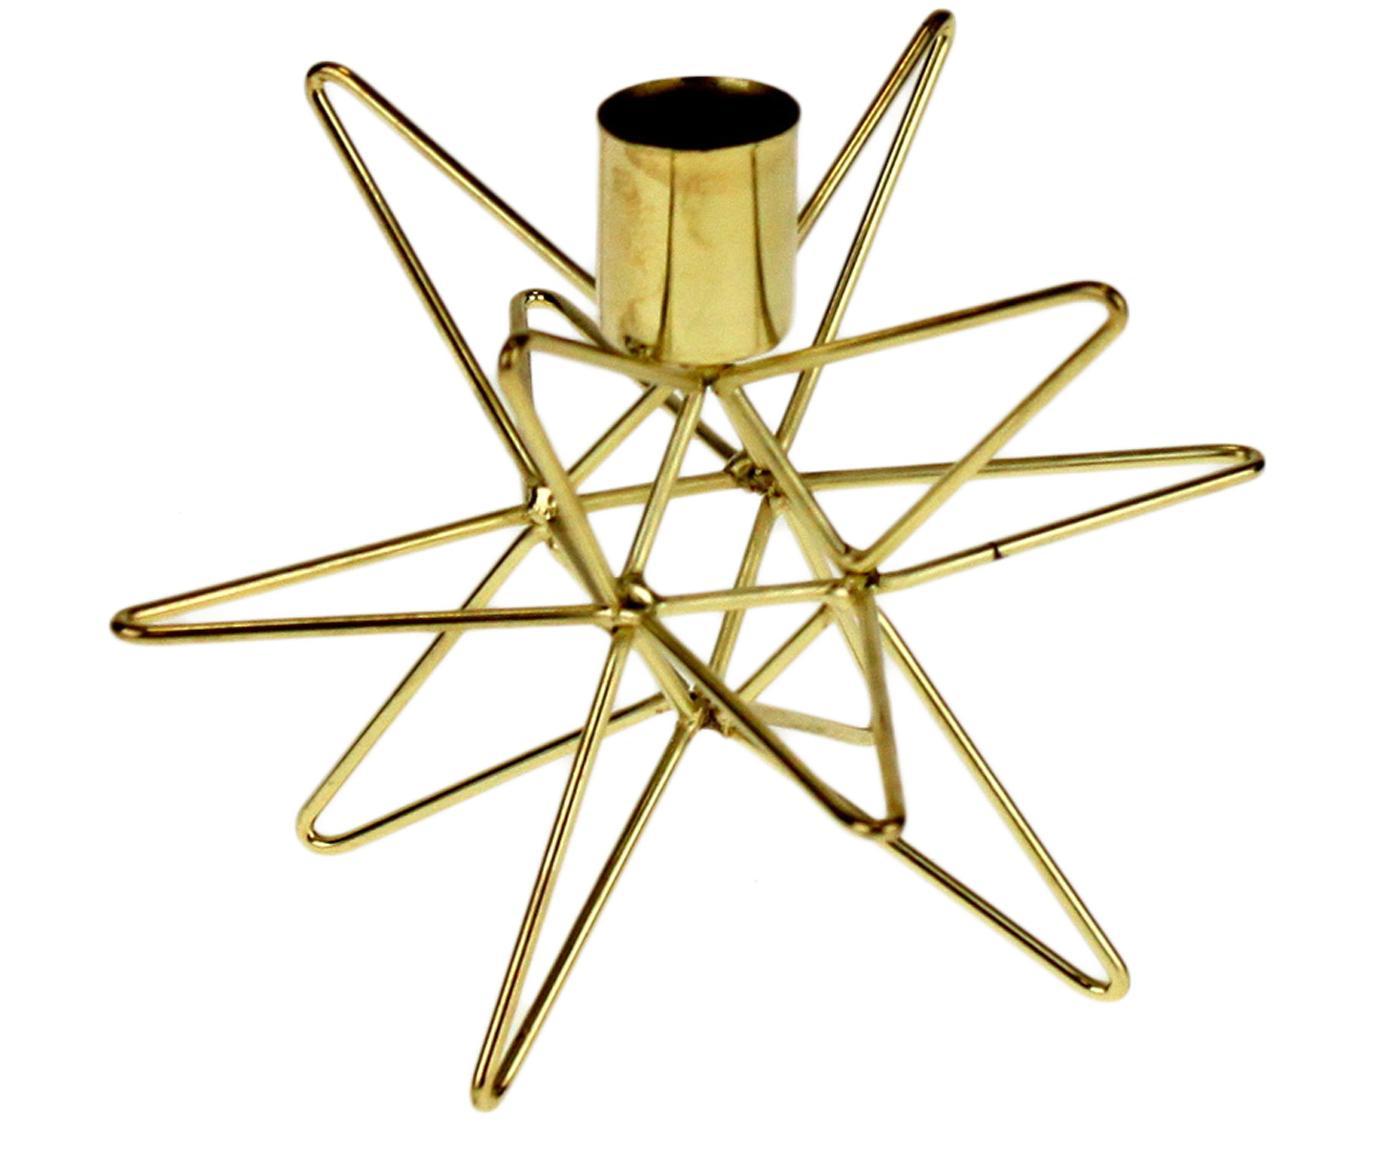 Portacandela dorato moderno Cosma, Metallo verniciato, Ottonato, Ø 15 x Alt. 11 cm